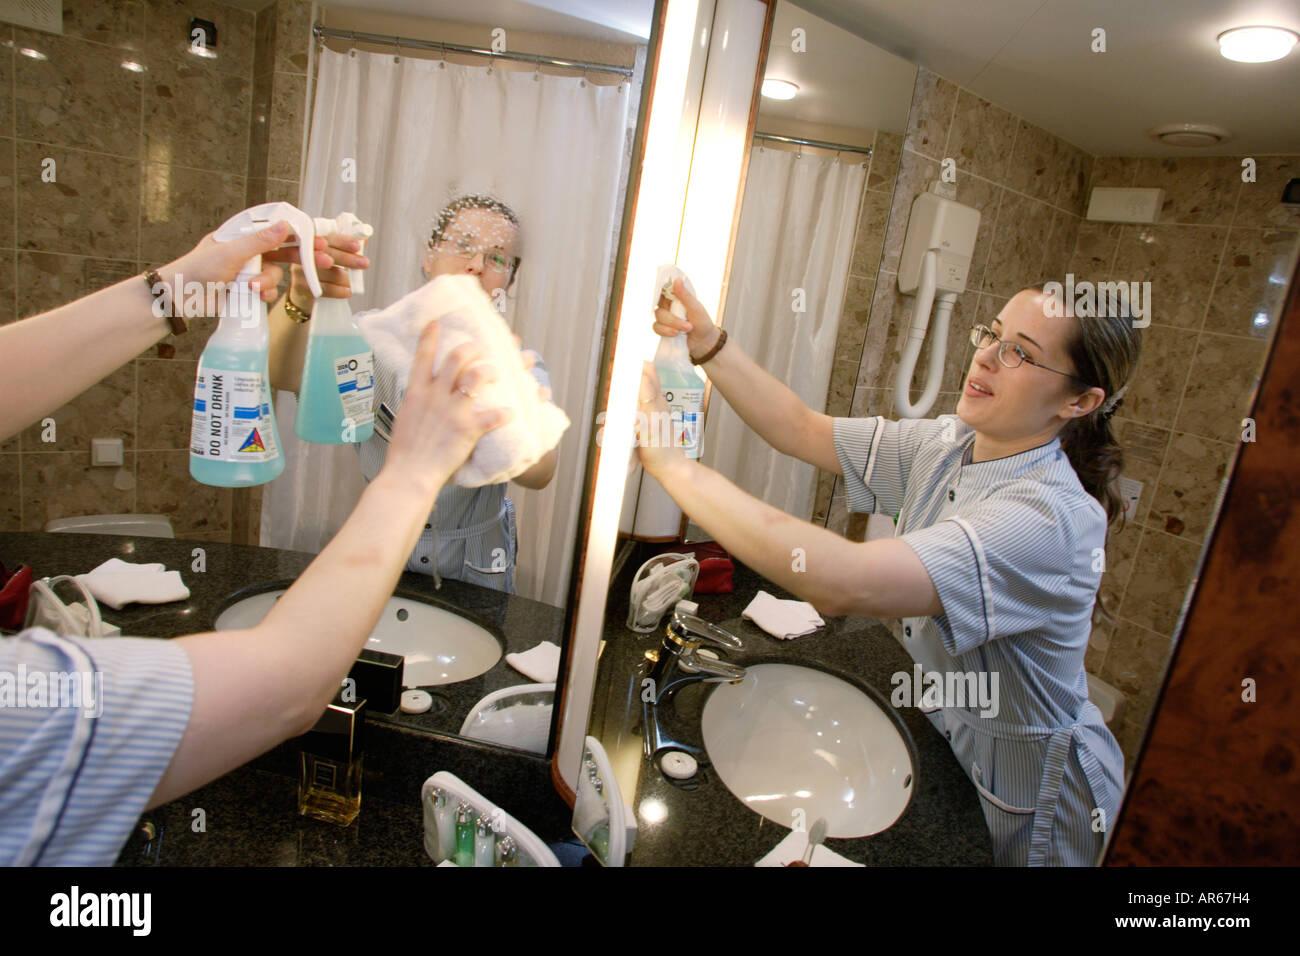 Staff Mirror Room Maid Bathroom Cruise Ship MS Delphin Stock - Bathroom maid